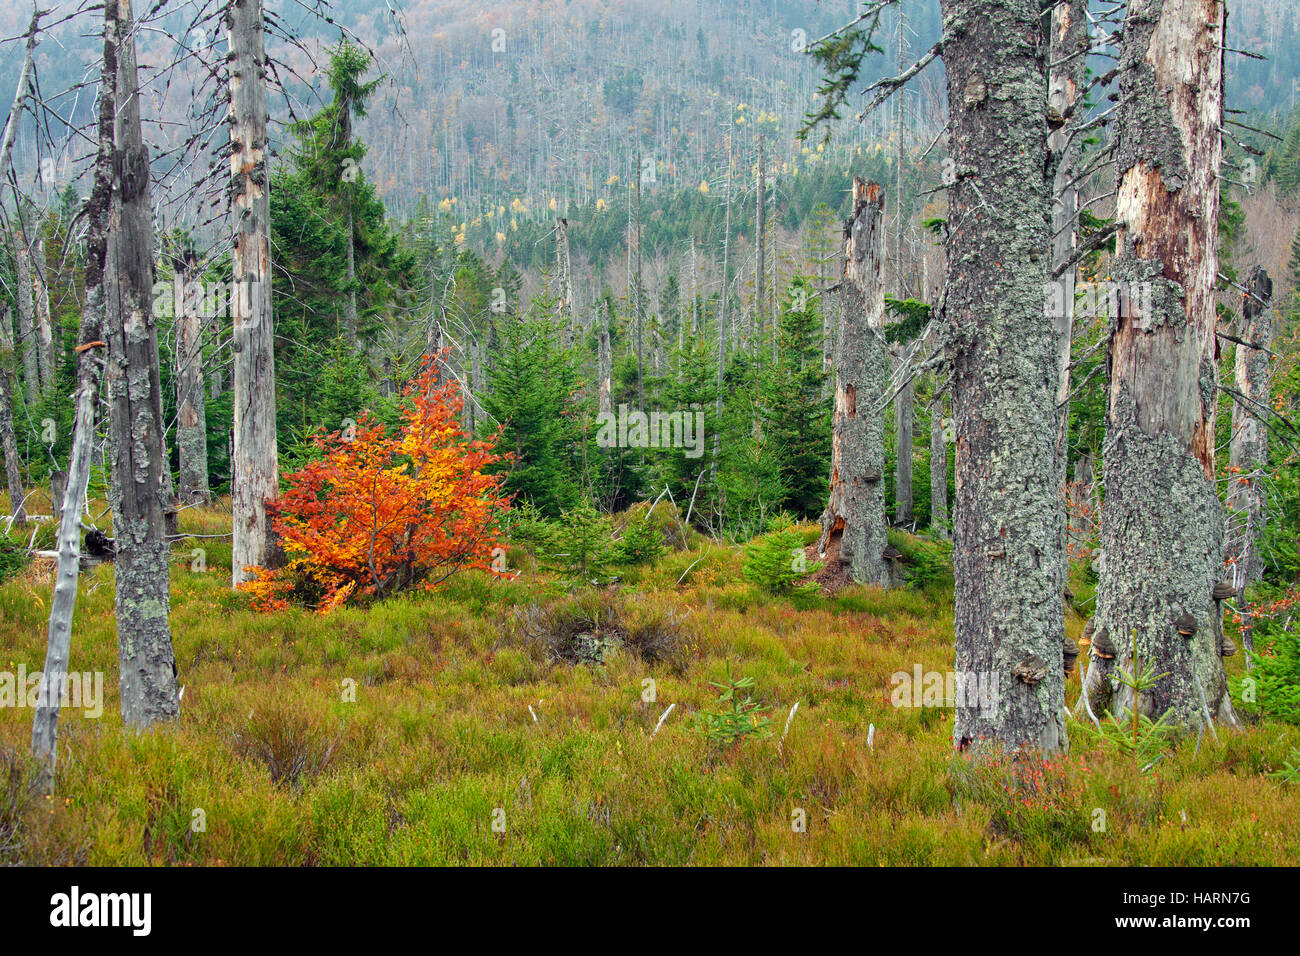 Killed spruce trees afflicted by European spruce bark beetle (Ips typographus L.) infestation on Rachel mountain, - Stock Image